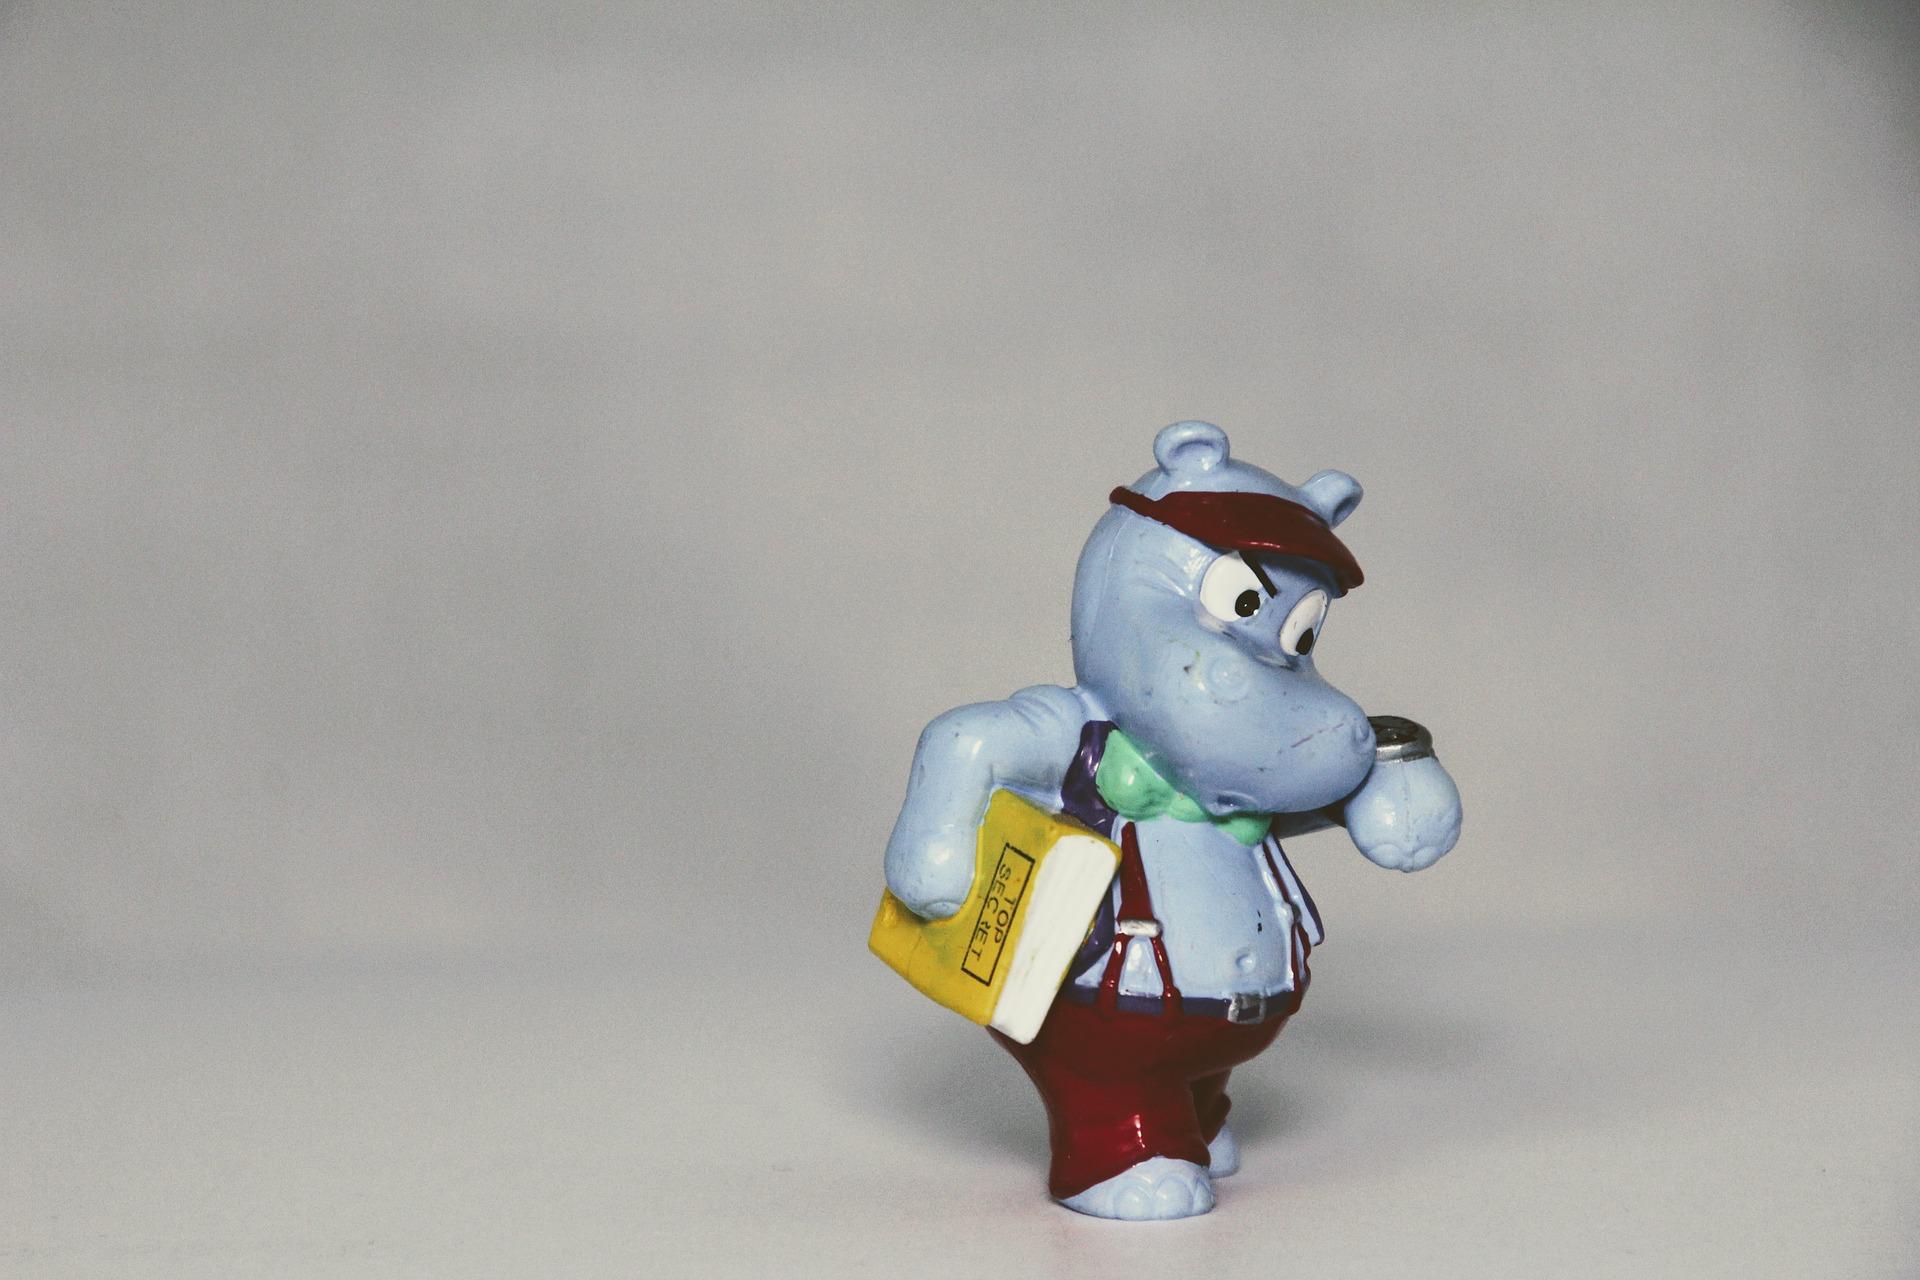 happy-hippo-2018286_1920.jpg